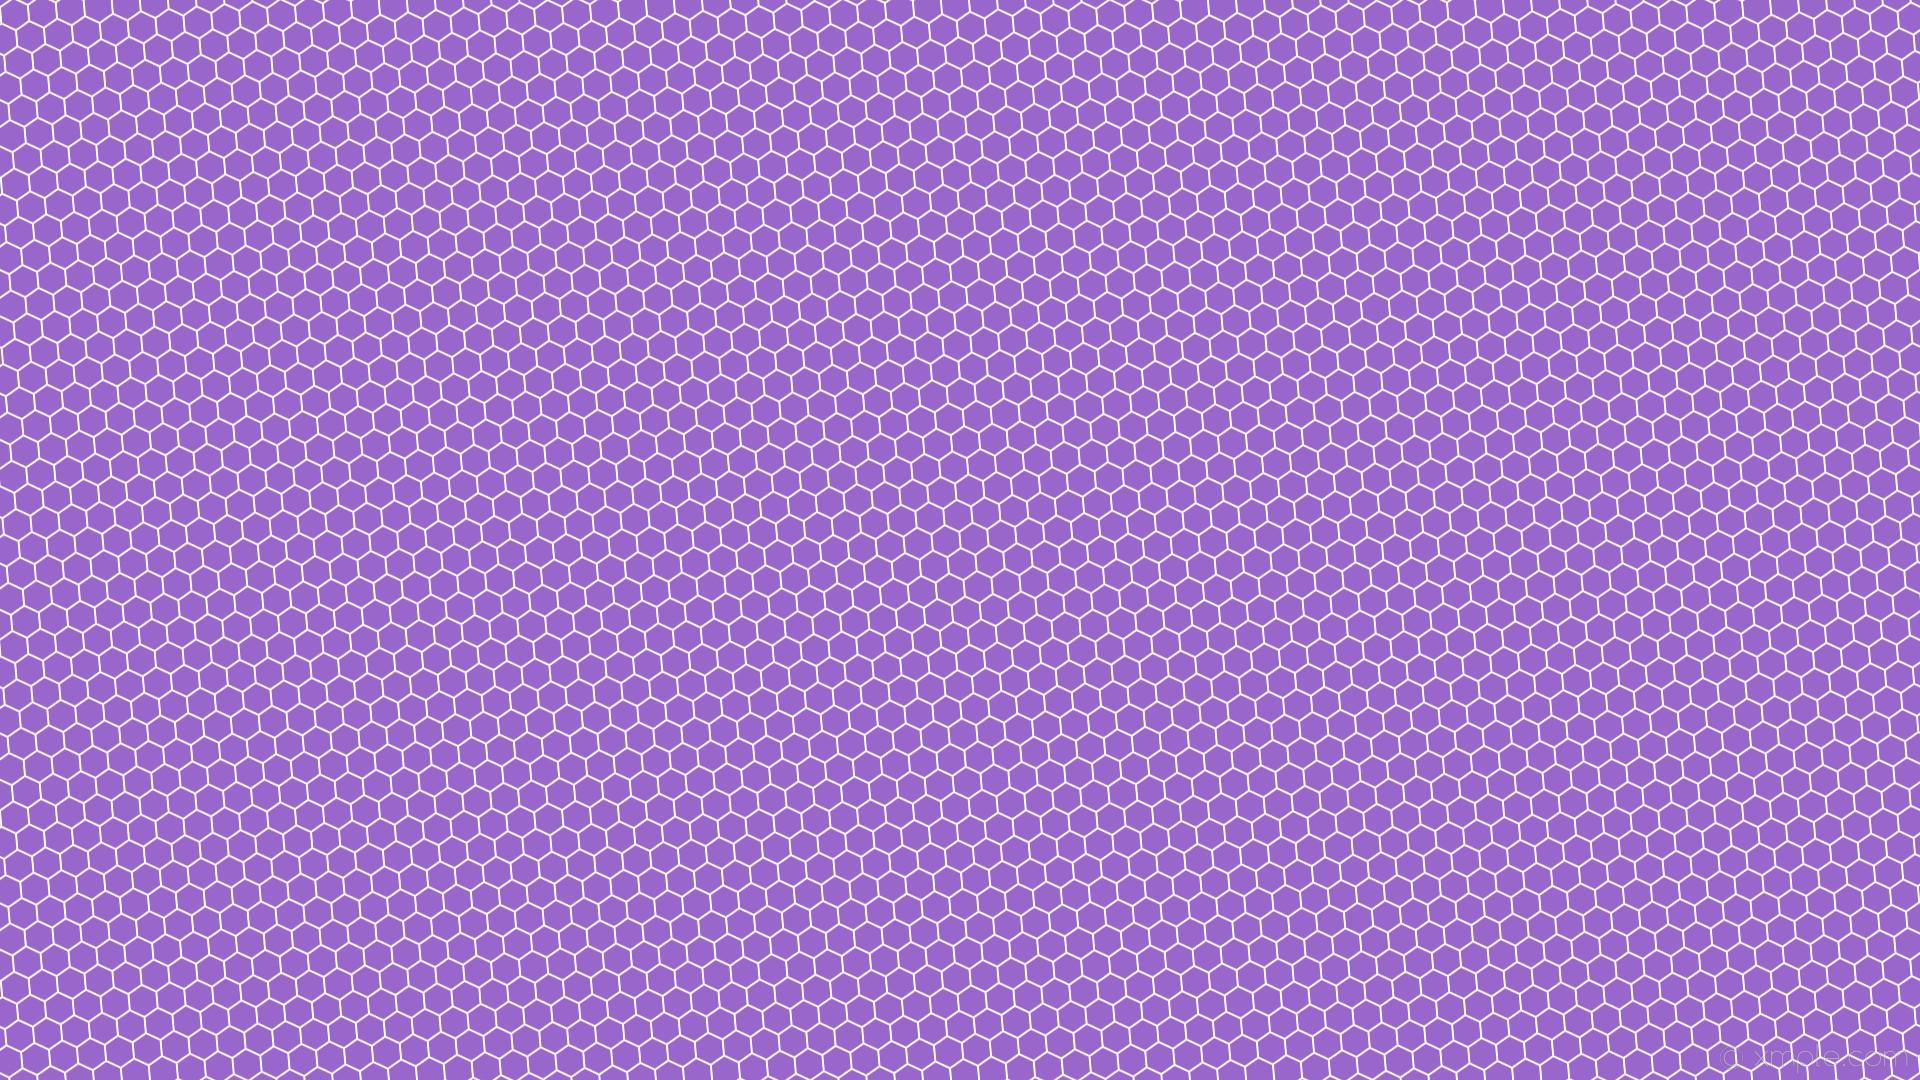 wallpaper purple hexagon honeycomb beehive white amethyst floral white  #9966cc #fffaf0 diagonal 5°